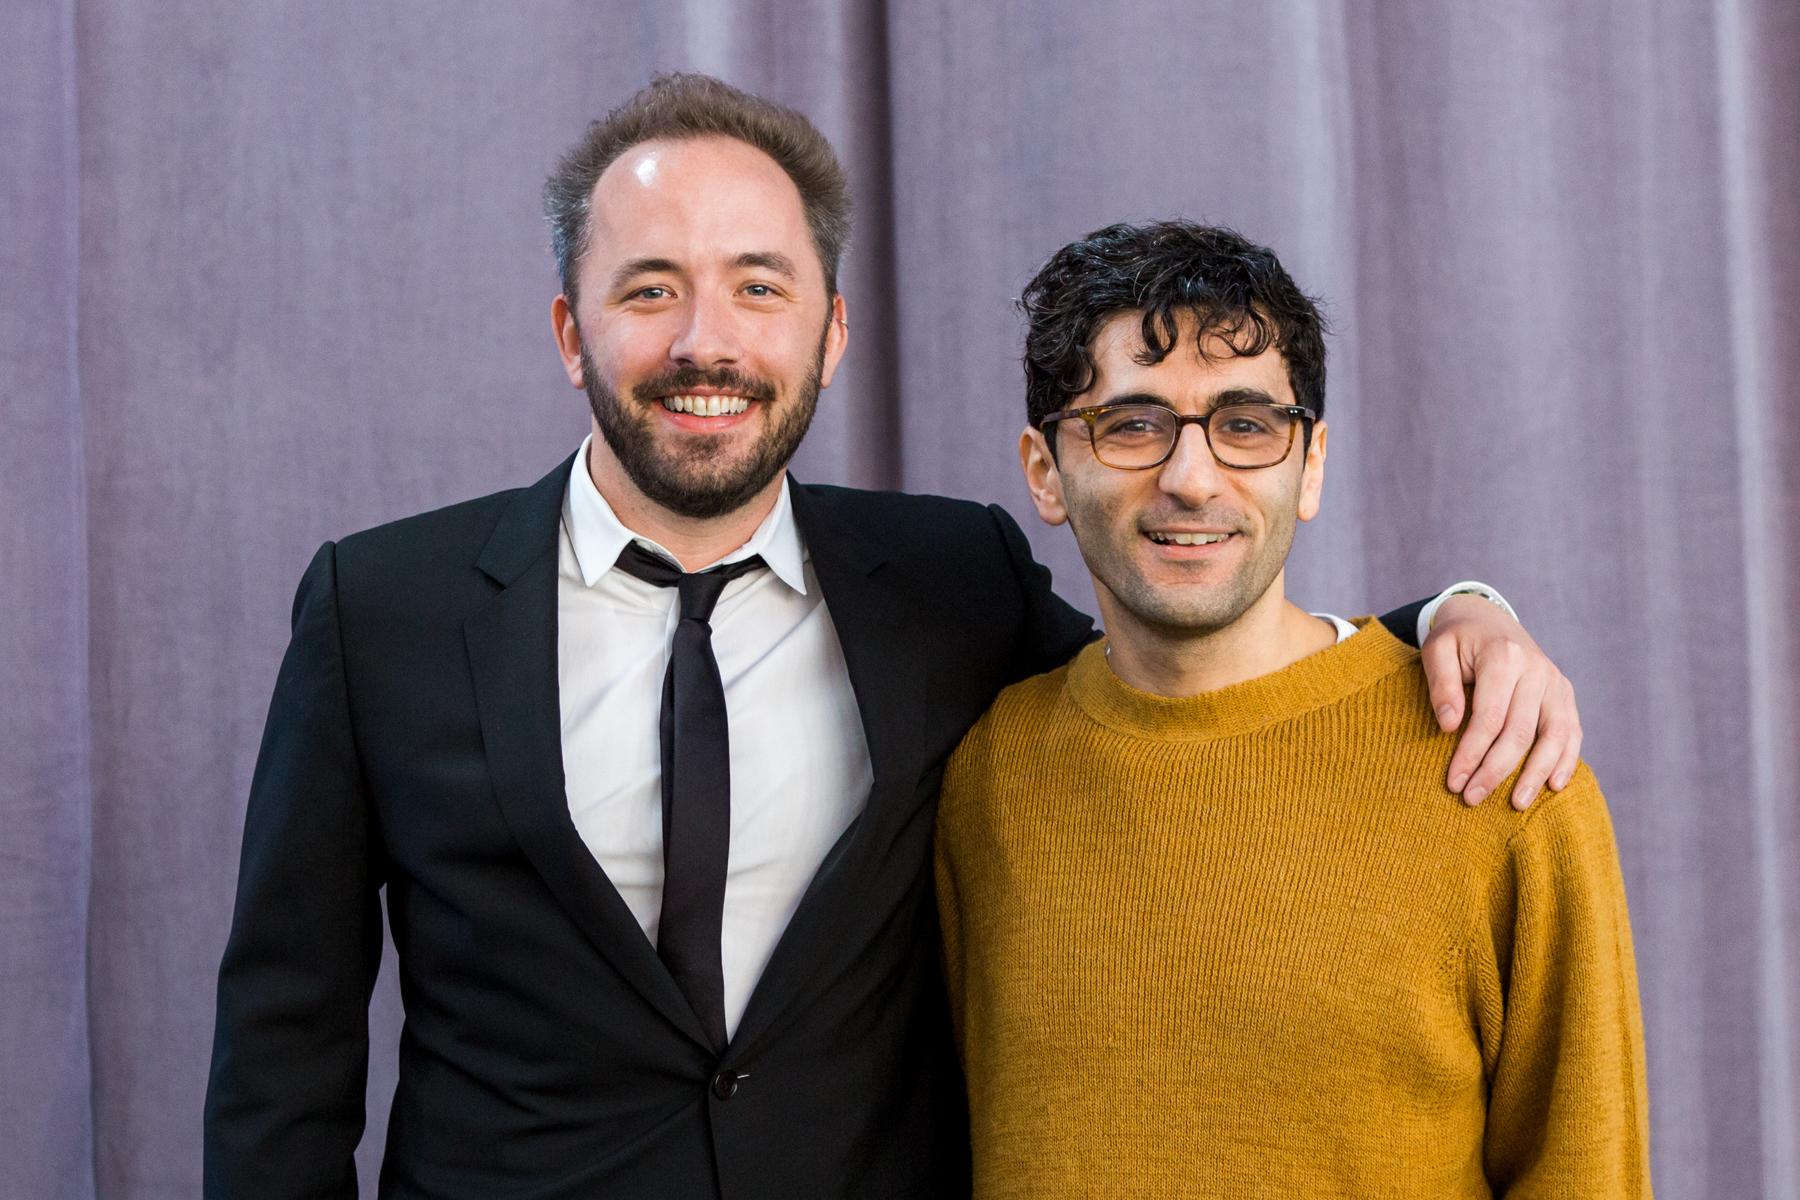 Drew Houston and Arash Ferdowsi standing together